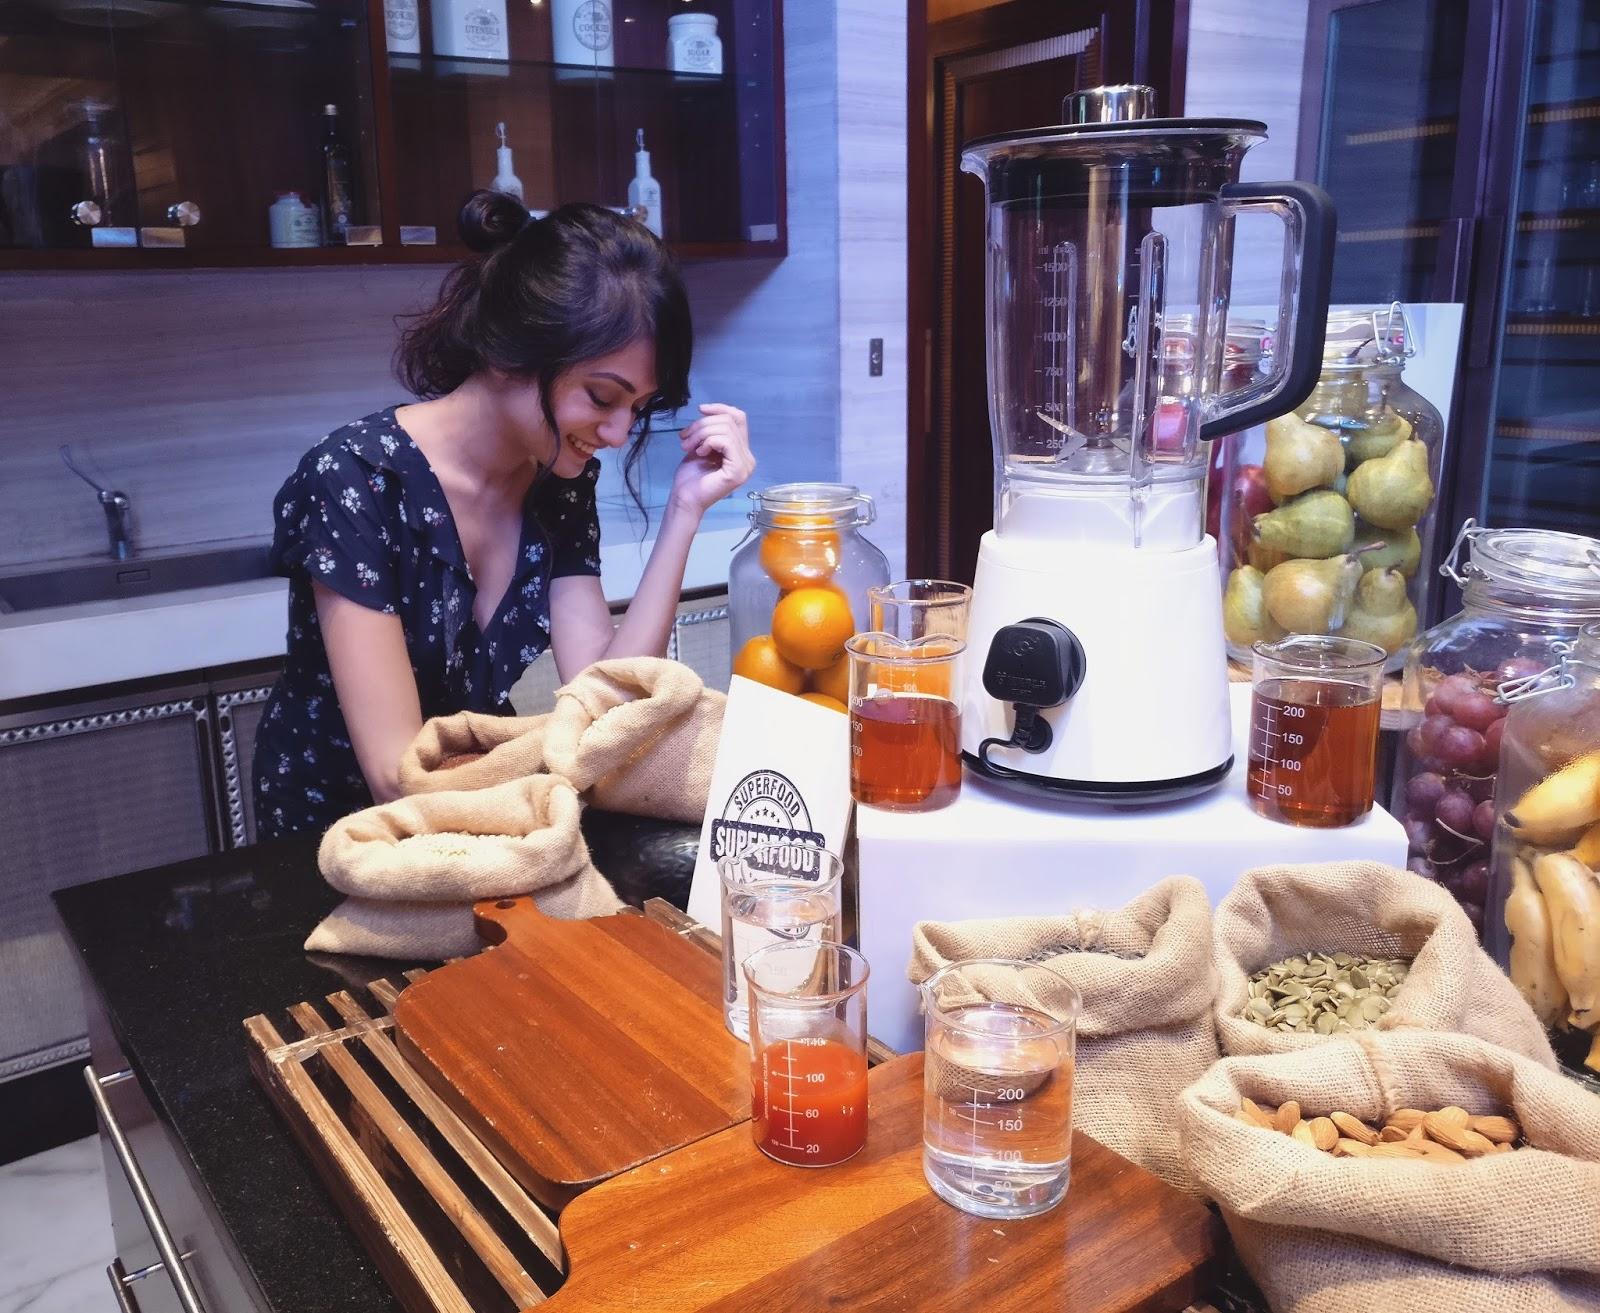 Morphy Richards Kitchen Utensils Set